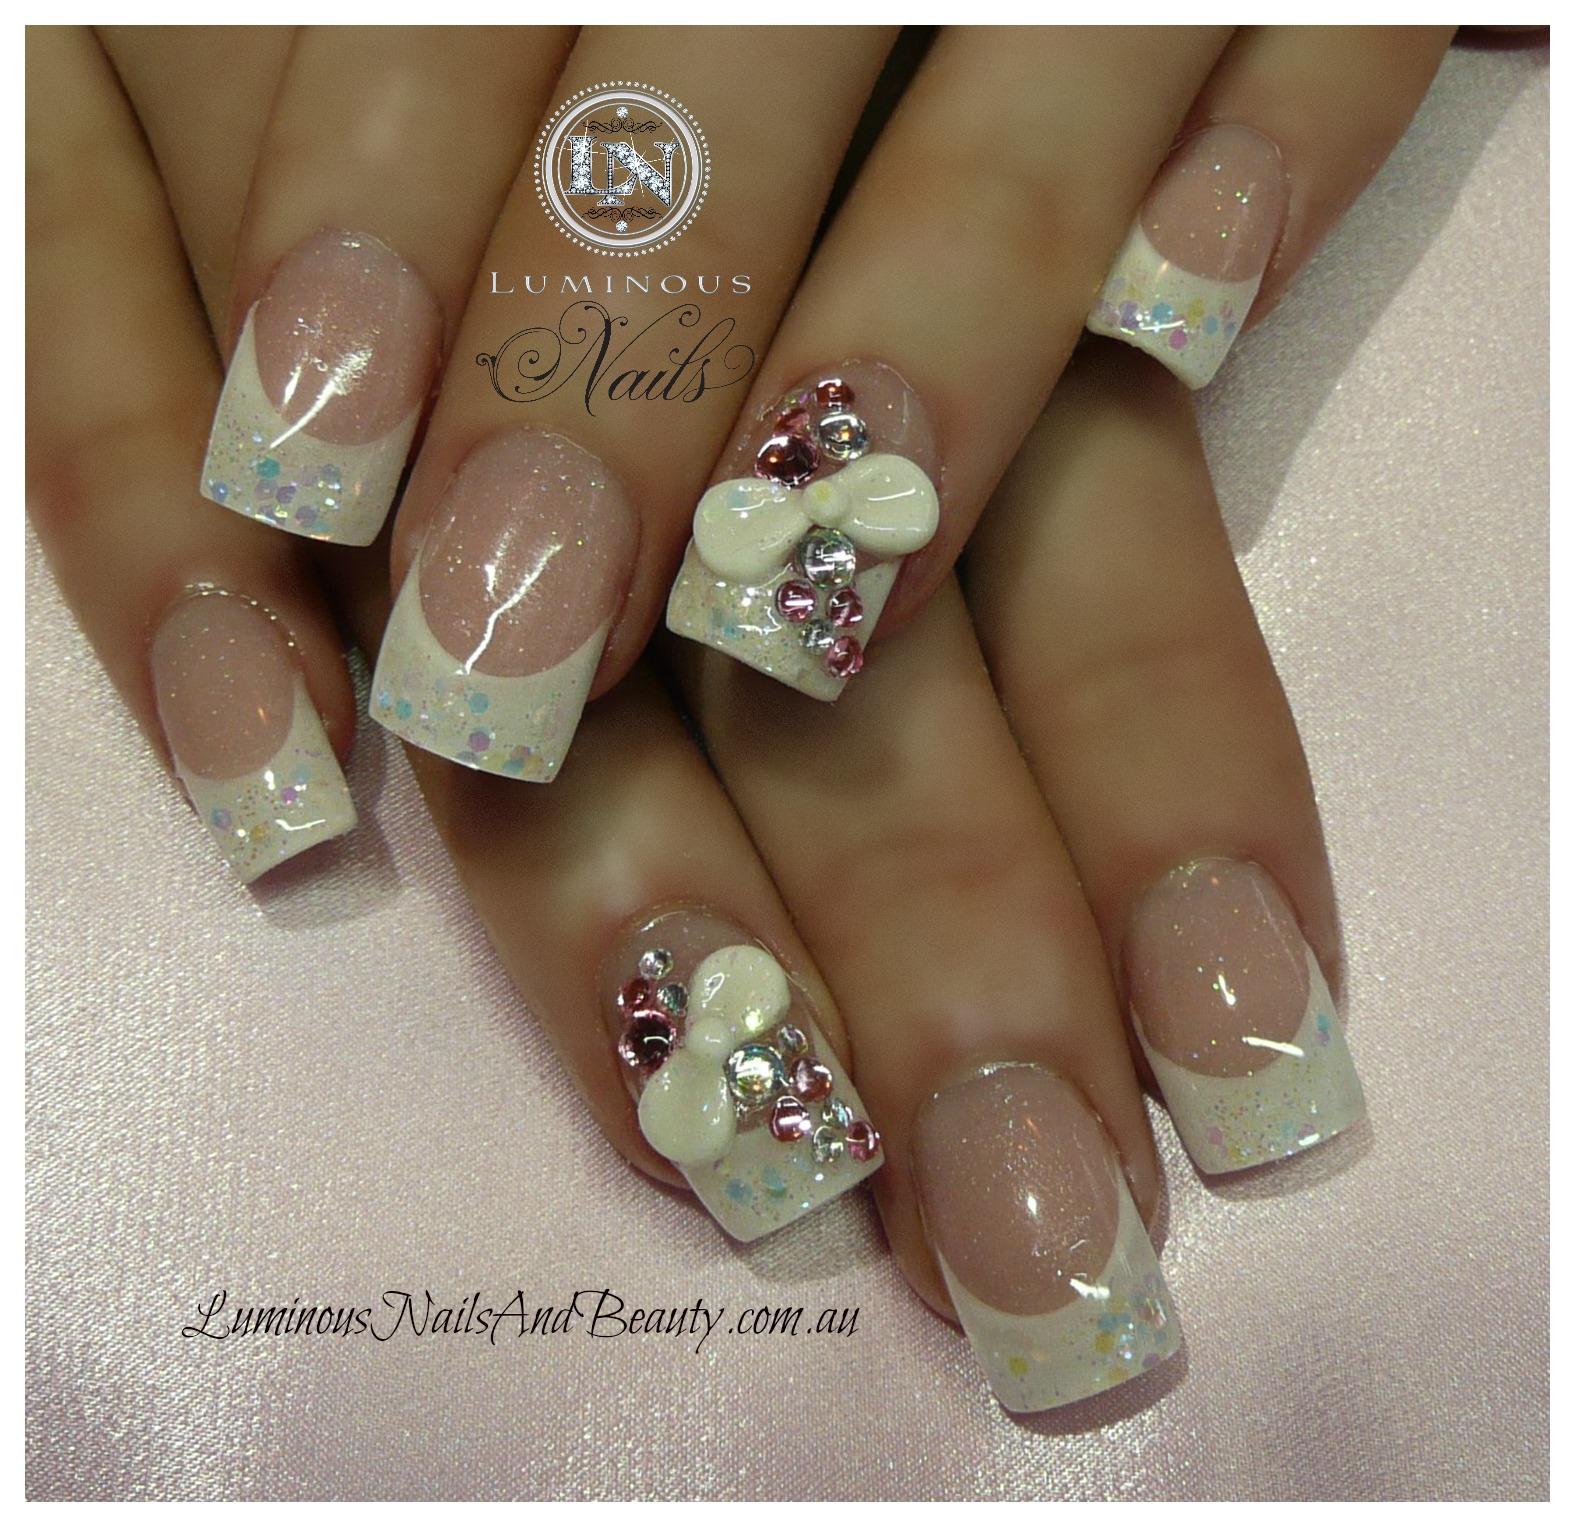 luminous nails september 2012